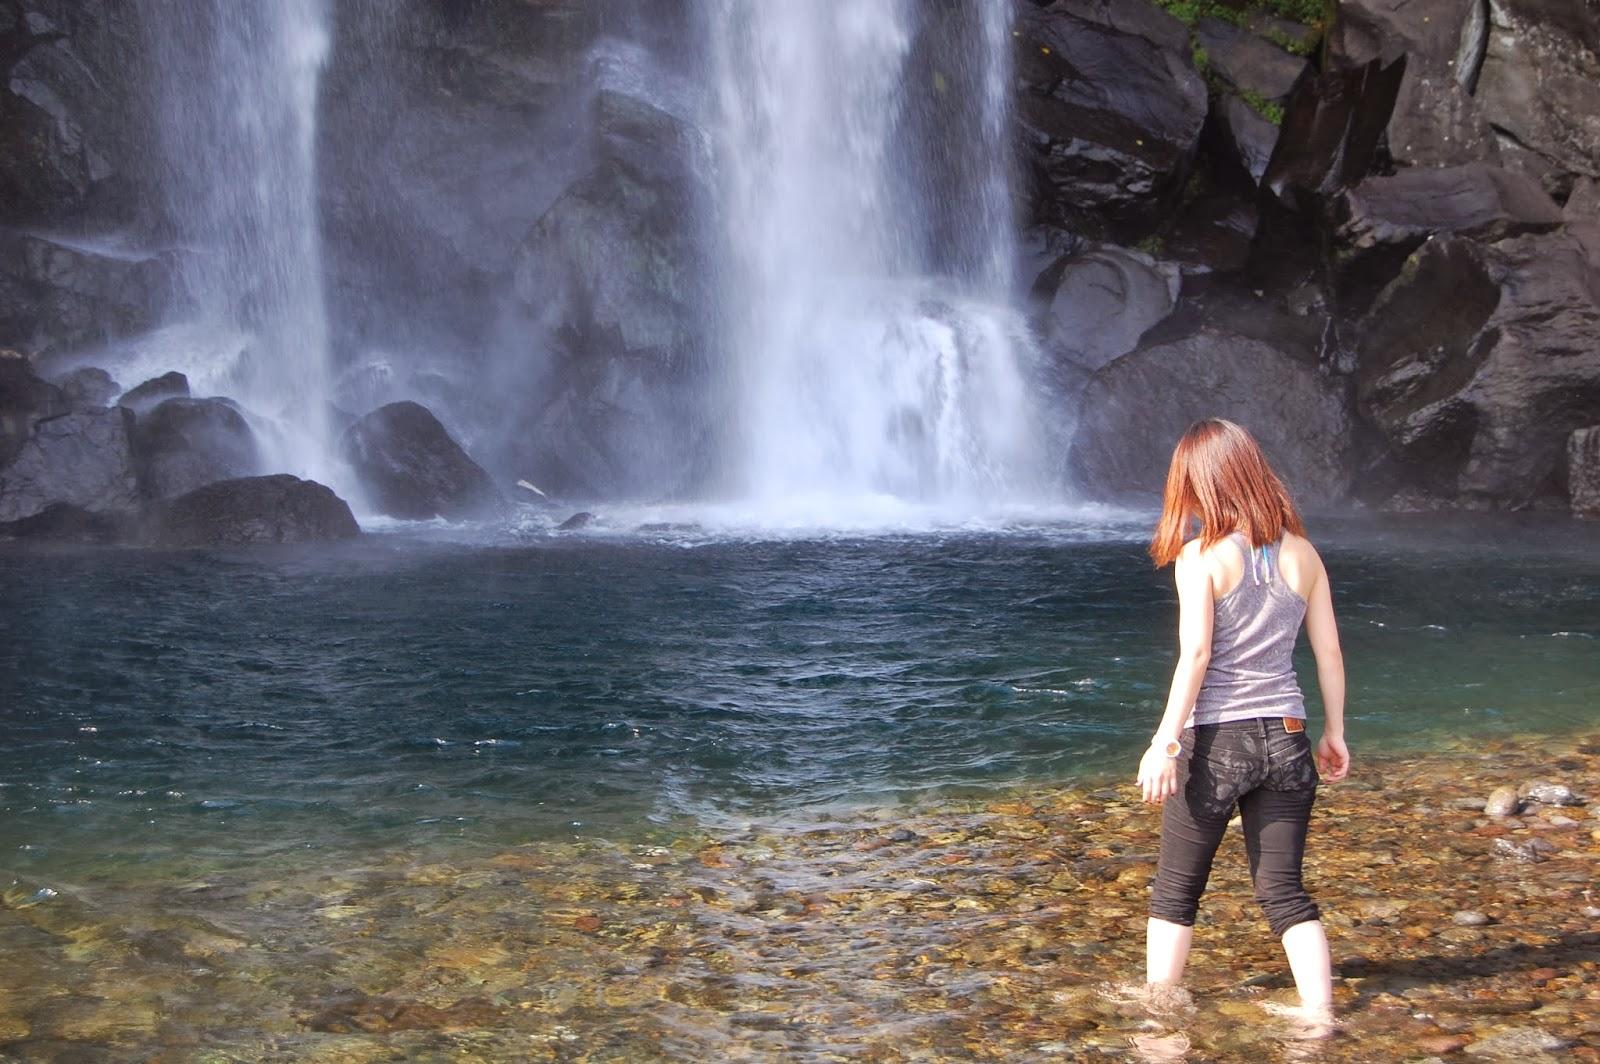 Tempat Wisata di Korea Selatan yang Terkenal dan Patut untuk dikunjungi ~ Kumpulan Tips dan